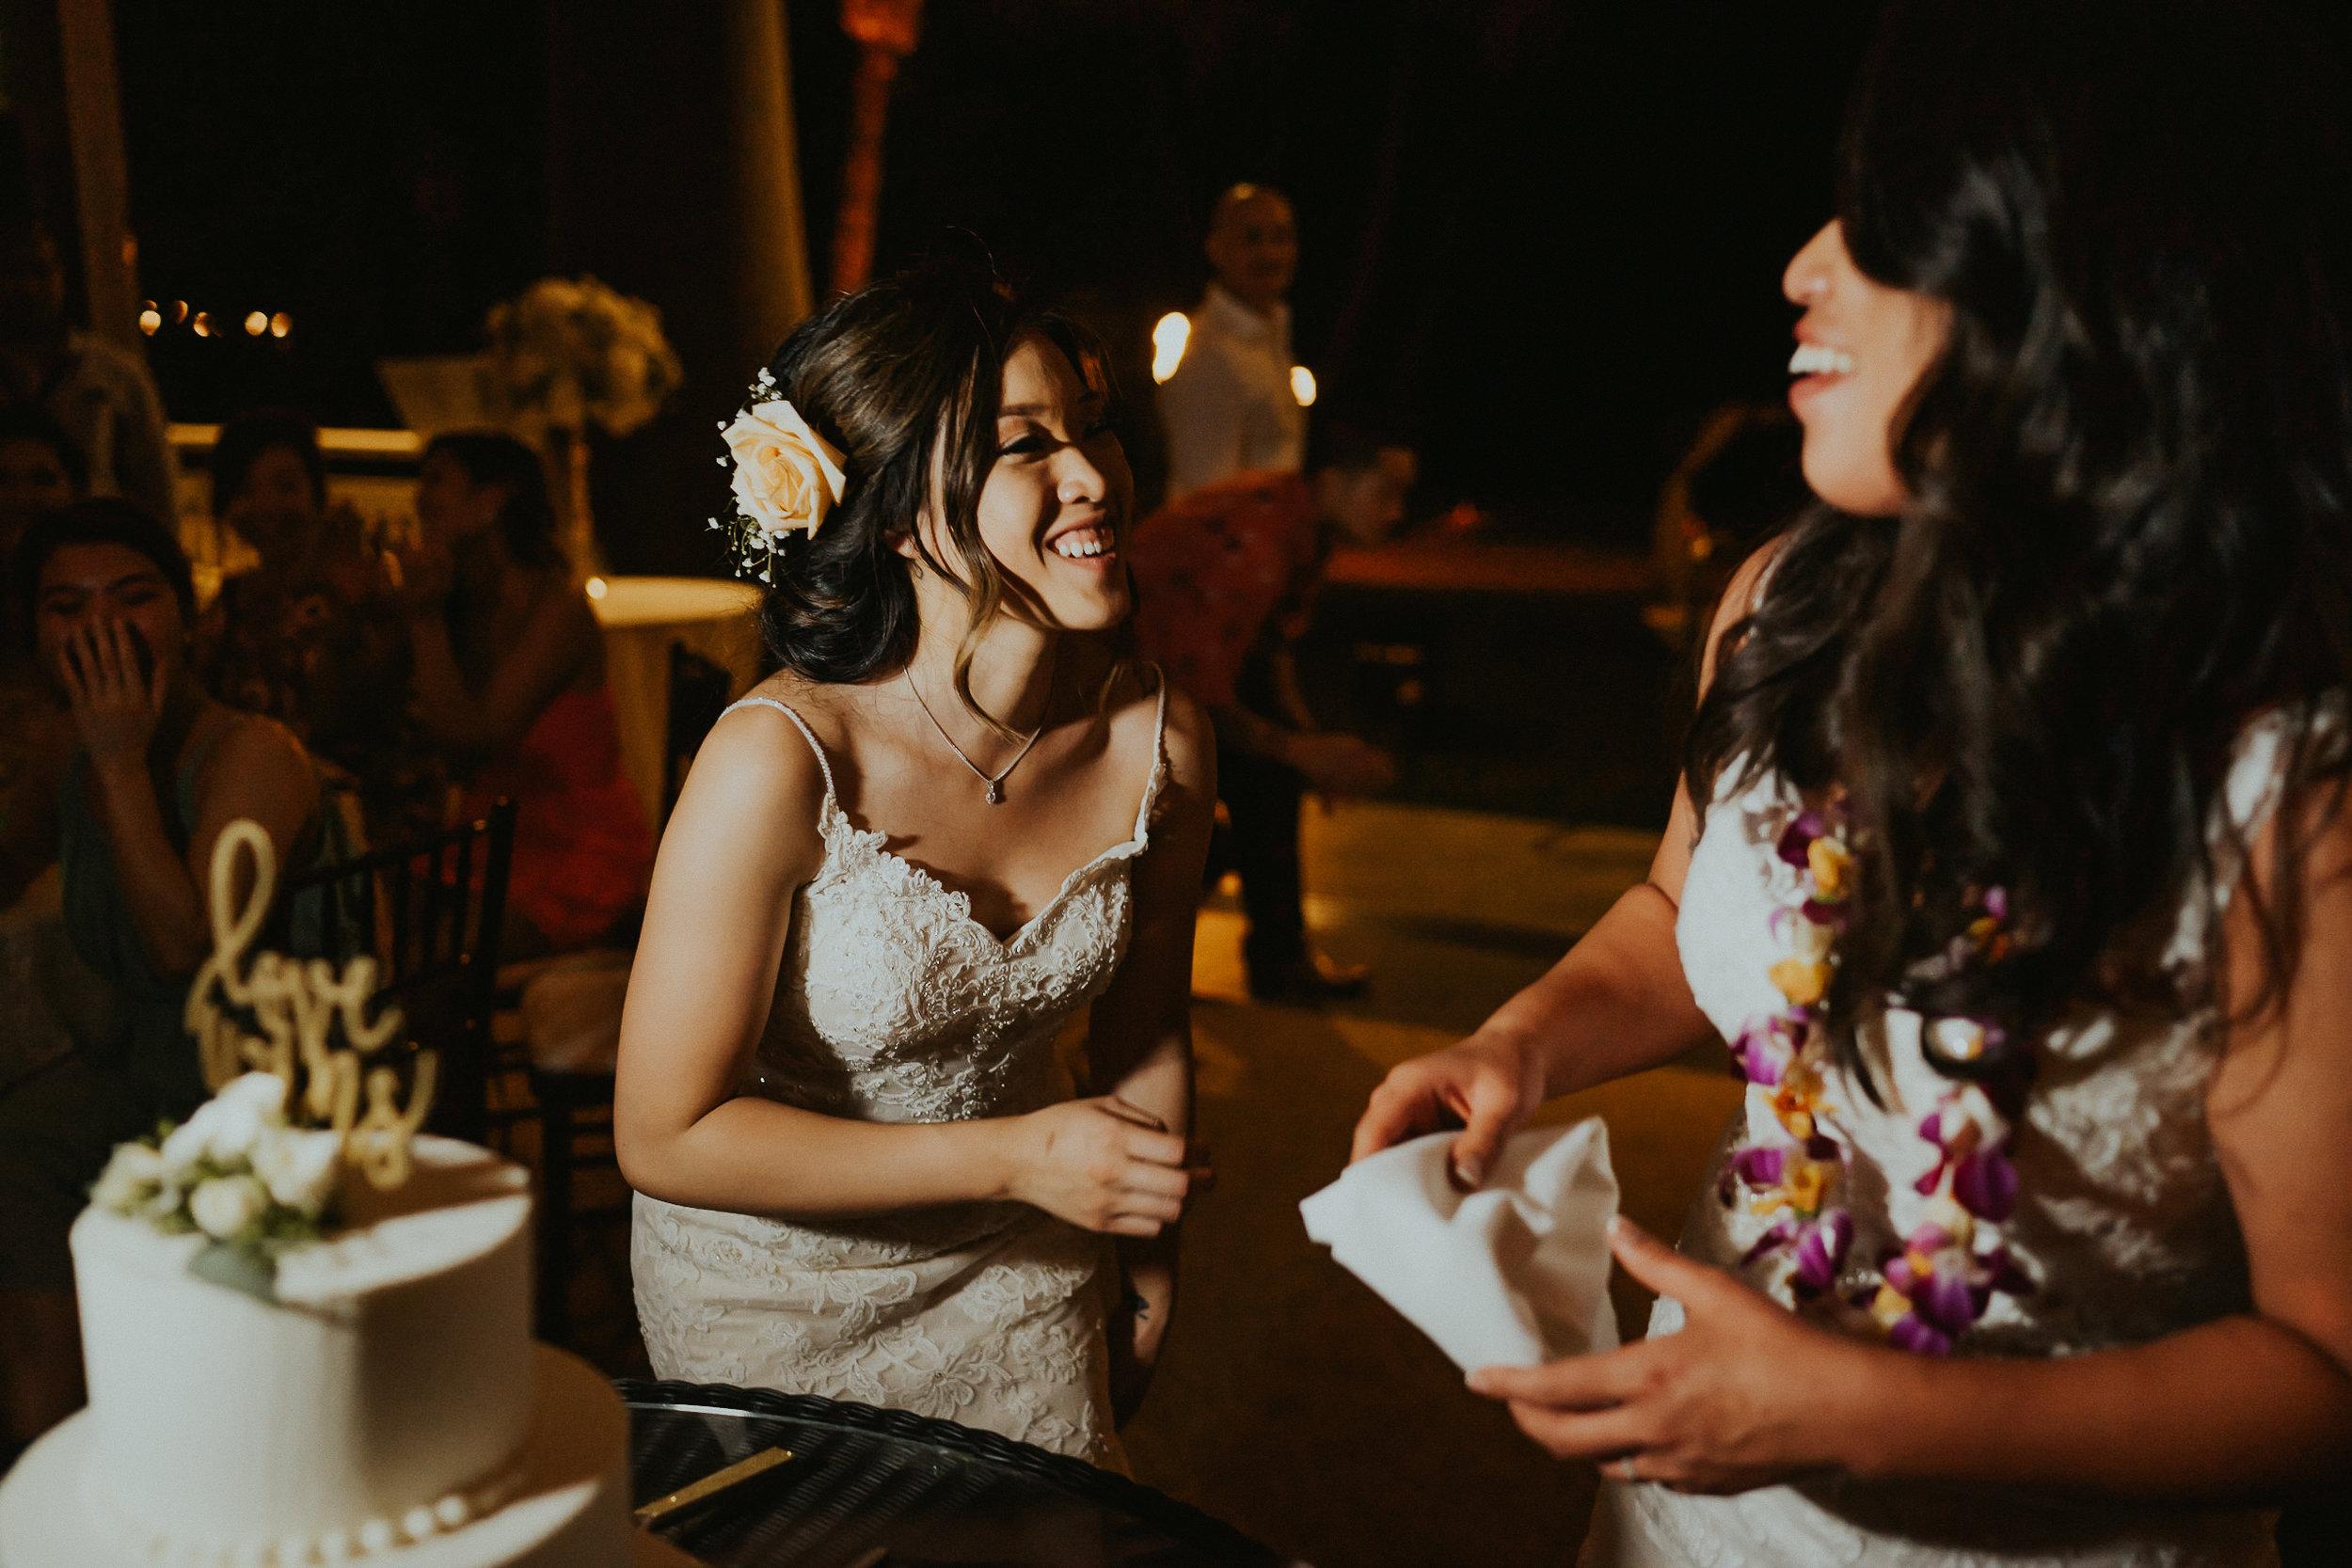 Maui_Destination_wedding_Alfred_Tang-98.jpg